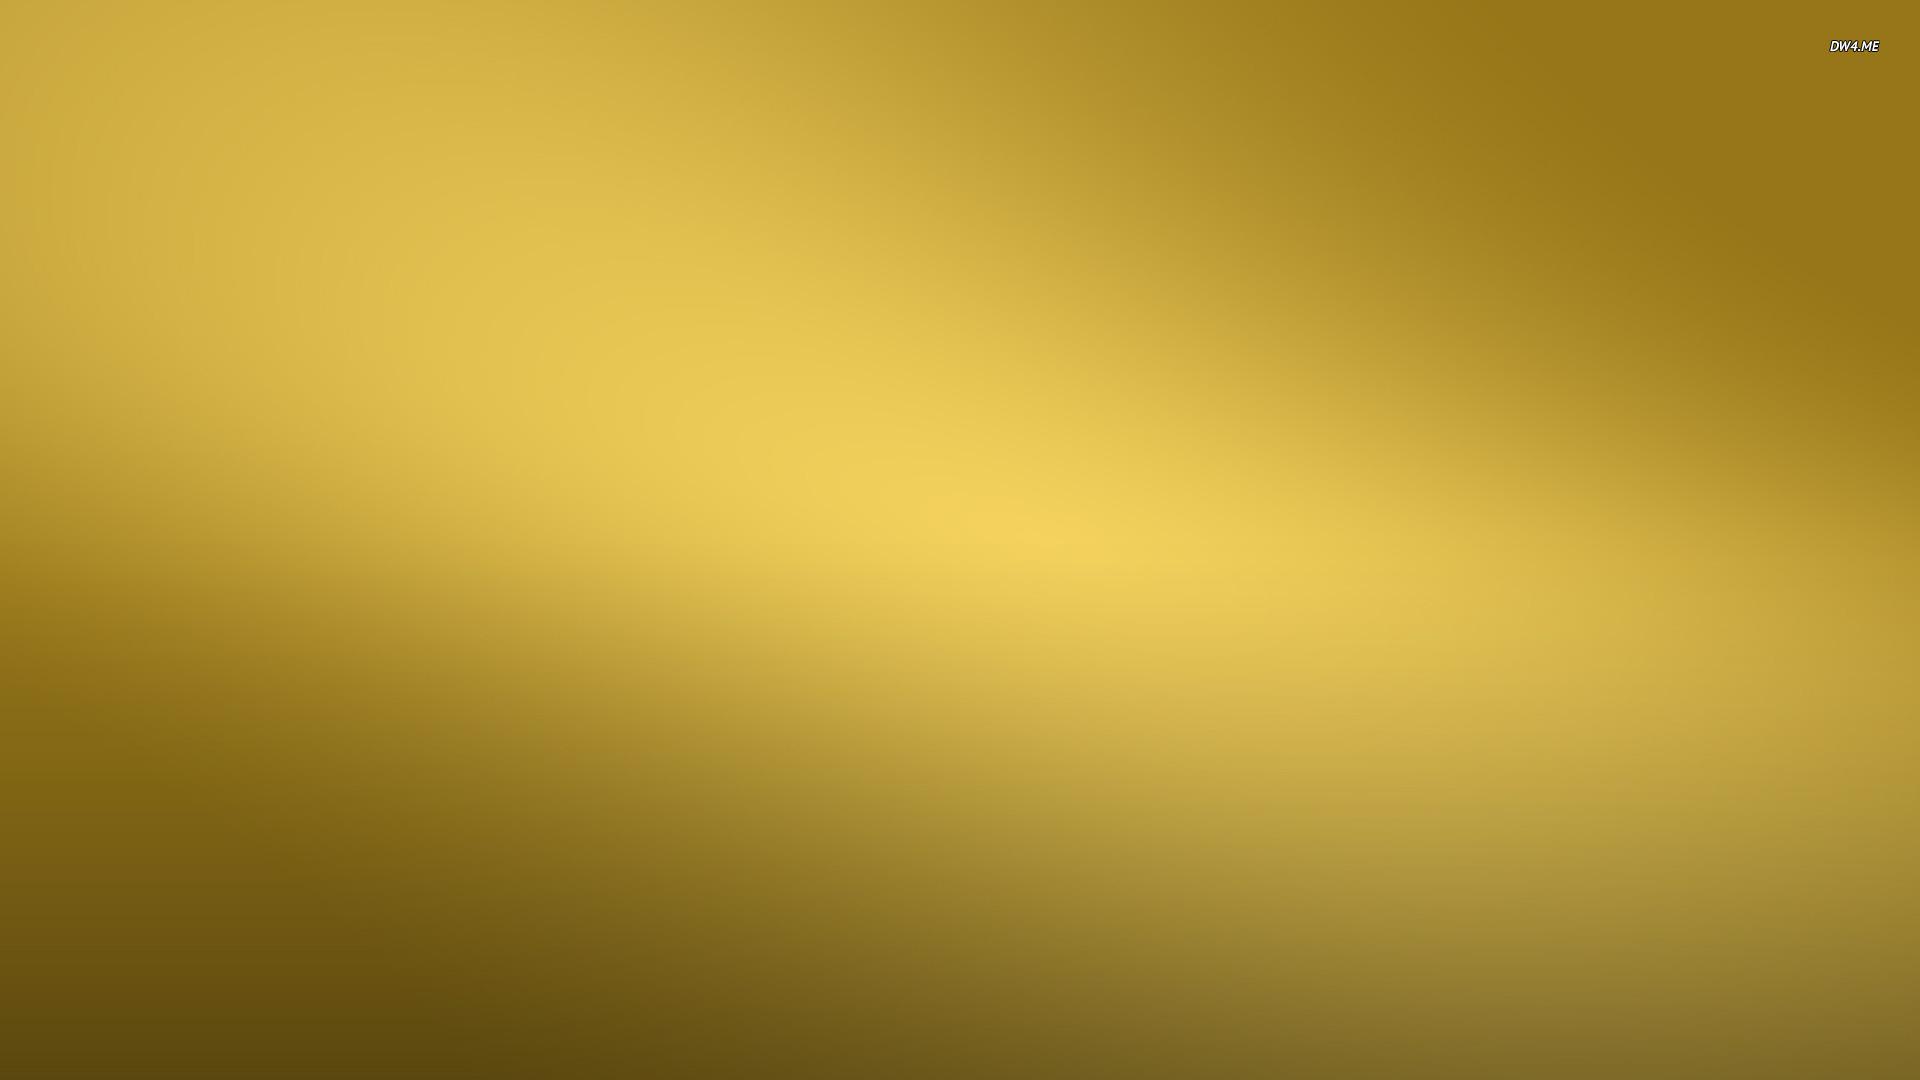 Gold sparkle background